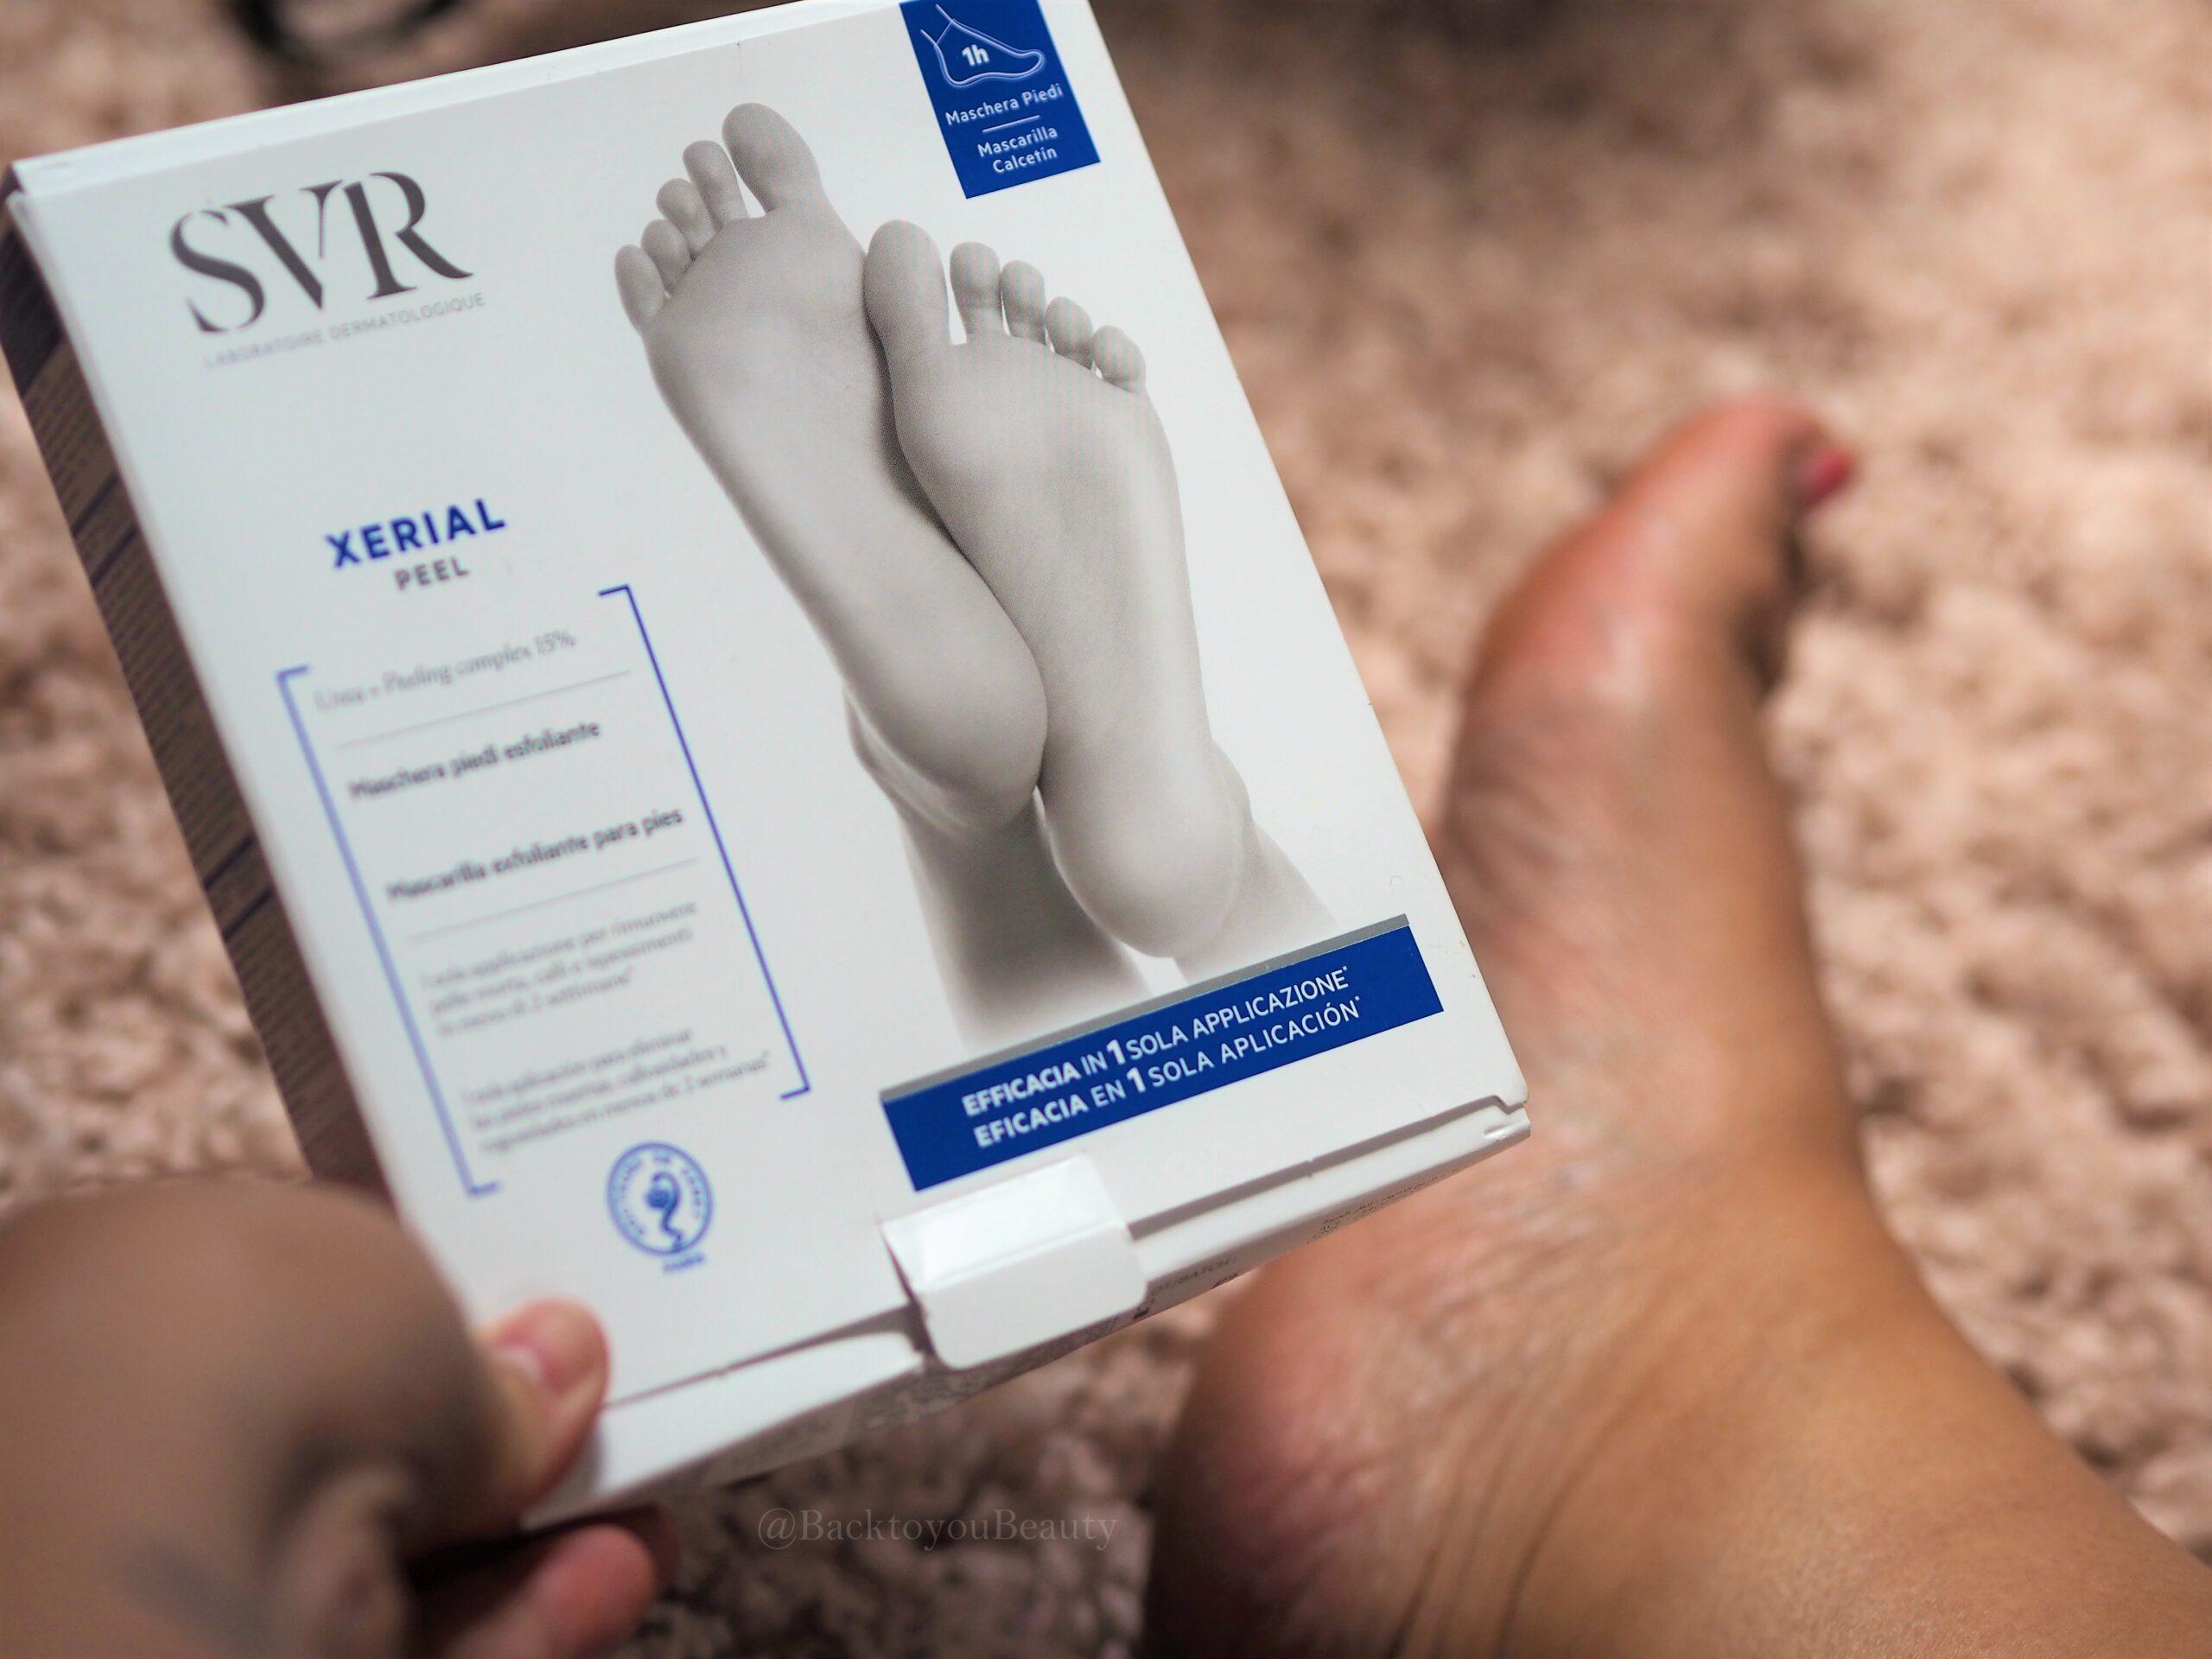 SVR Foot Peel